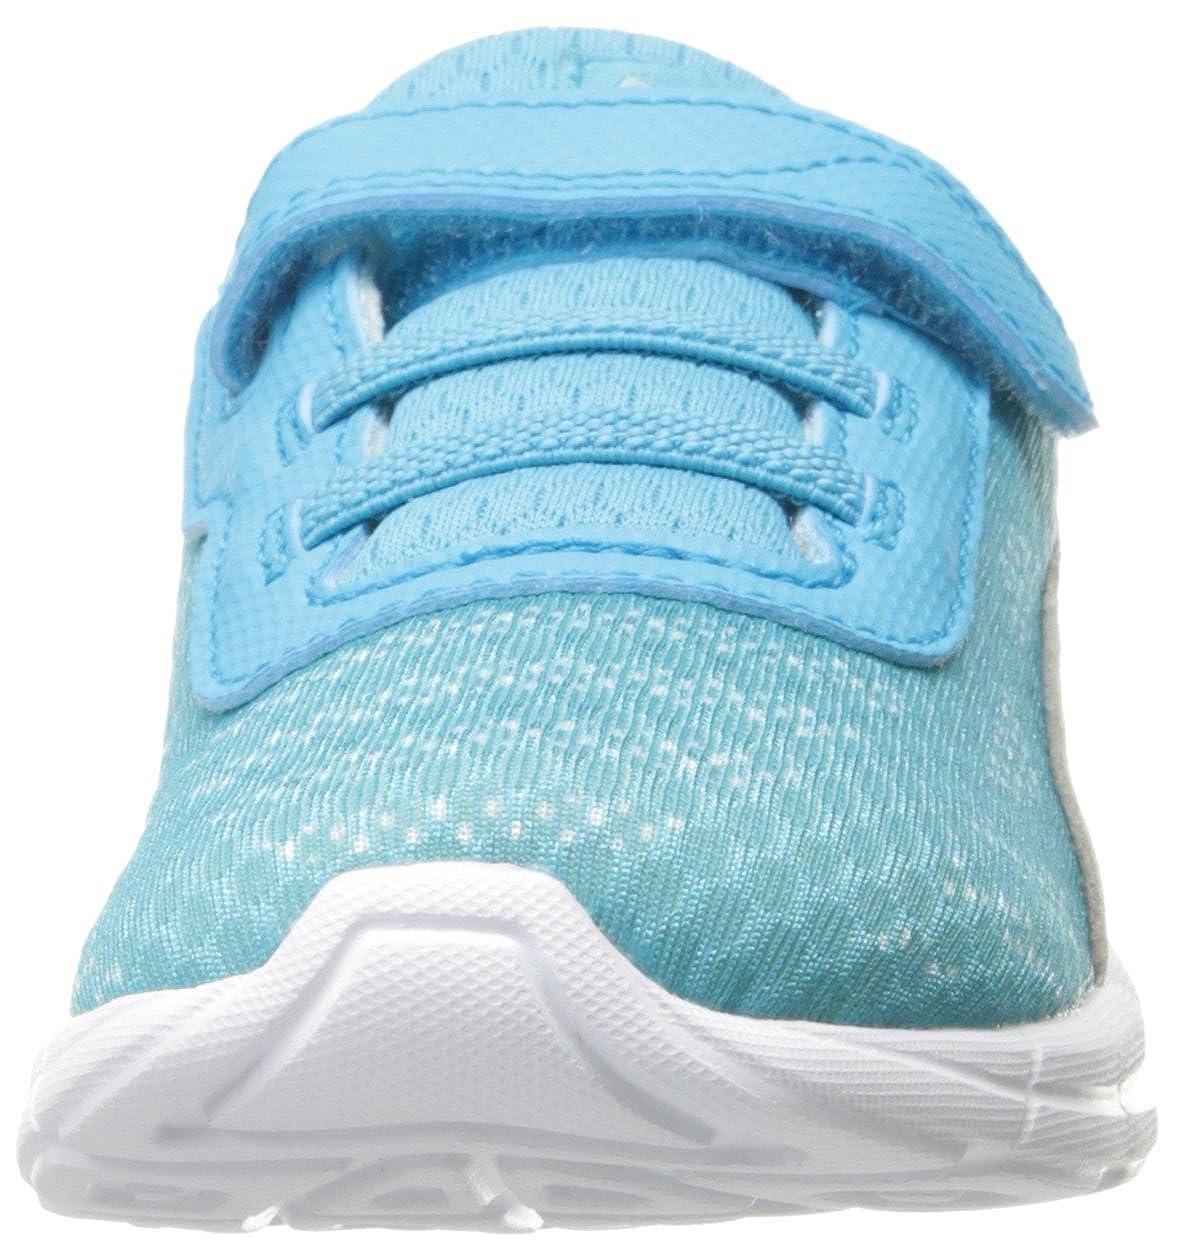 Toddler METEOR V INF/_PRNT PUMA Meteor V INF Running Shoe